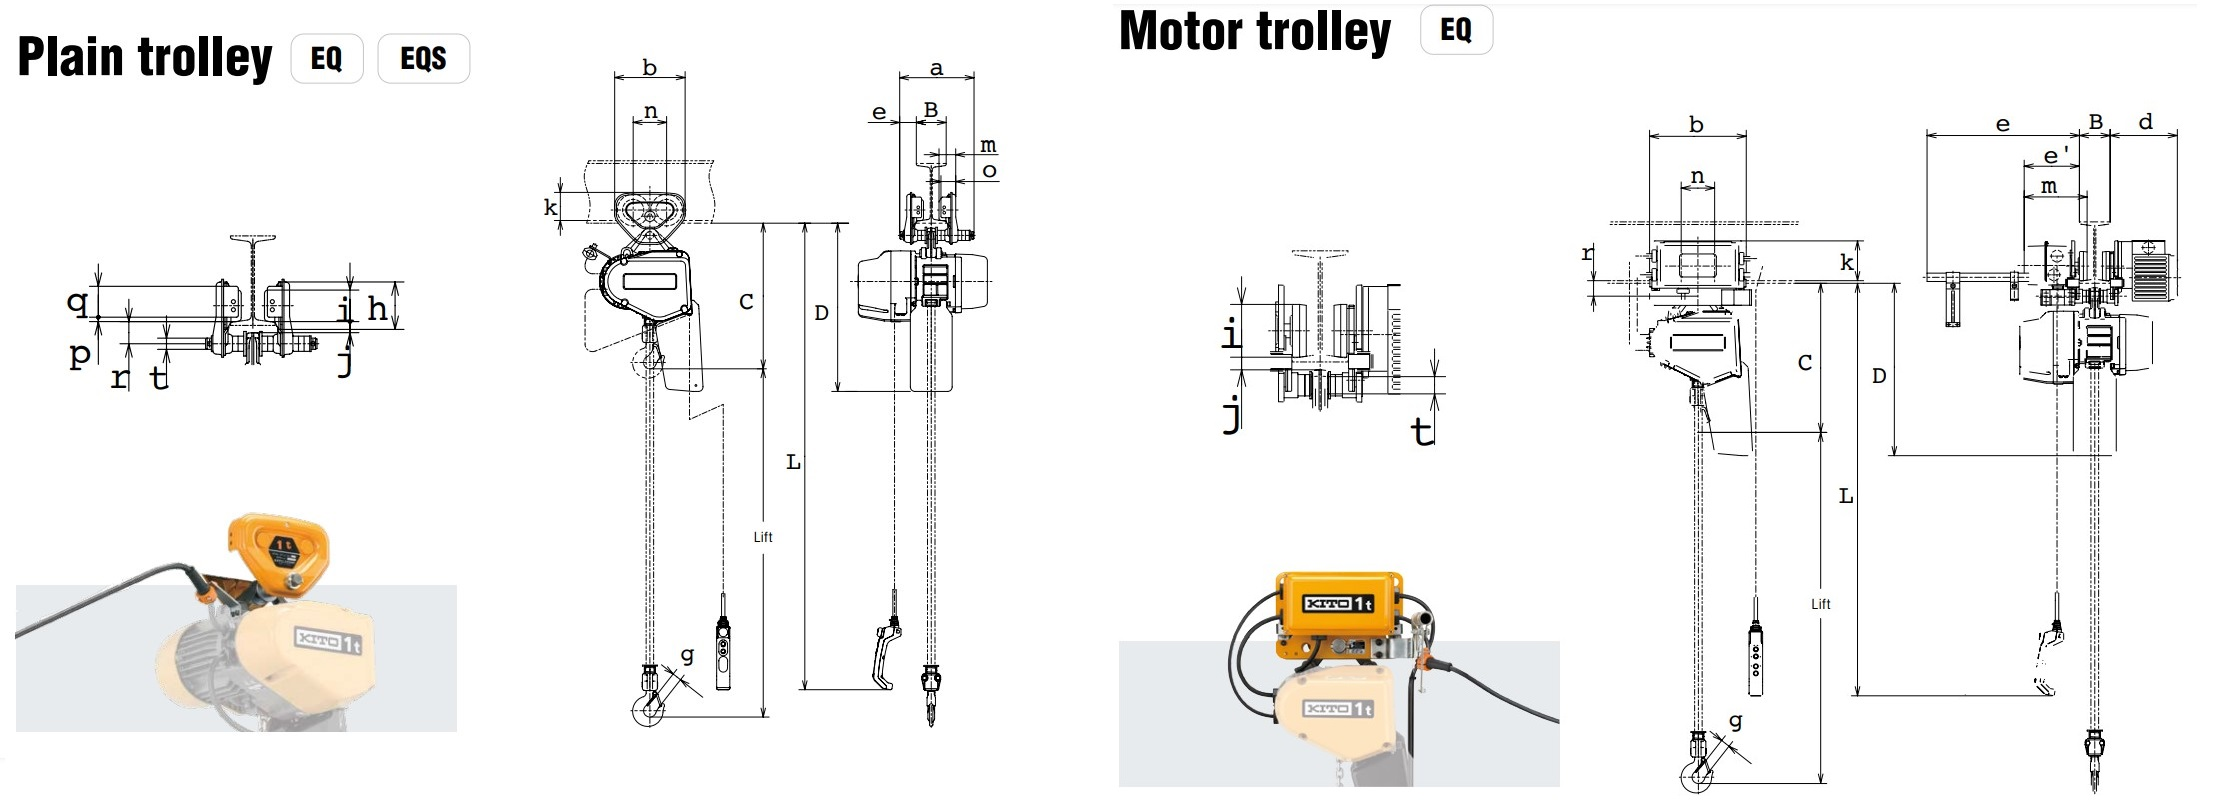 Kito EQ trolley dimensions